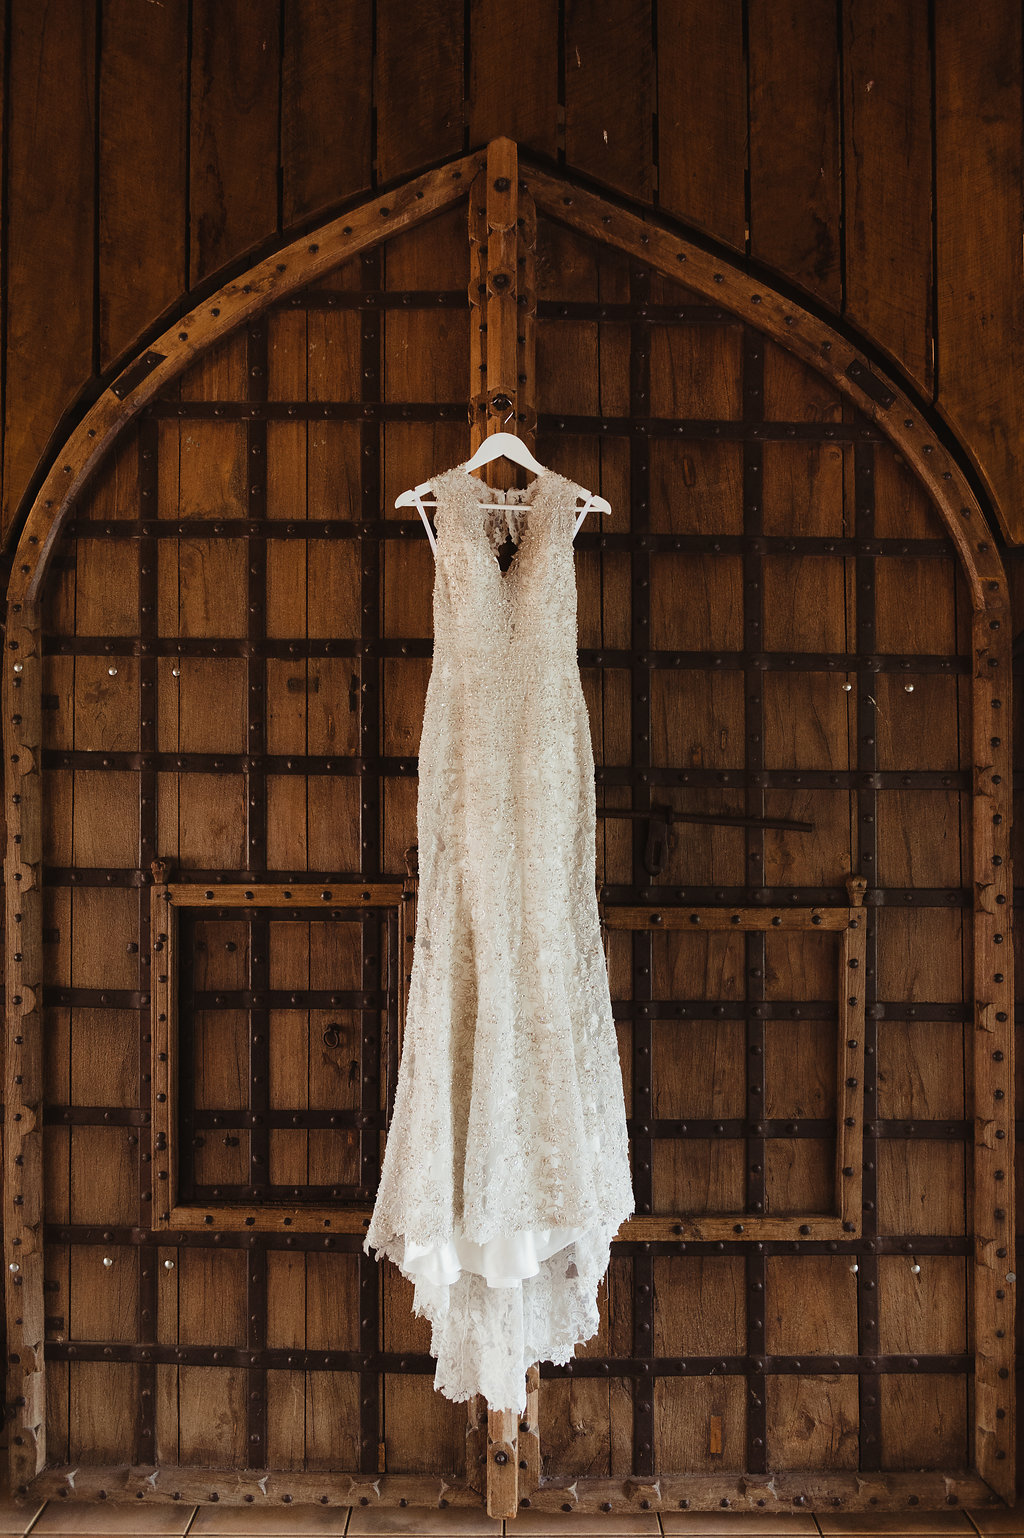 Brides Wedding Dress - Wedding Planning Hunter Valley